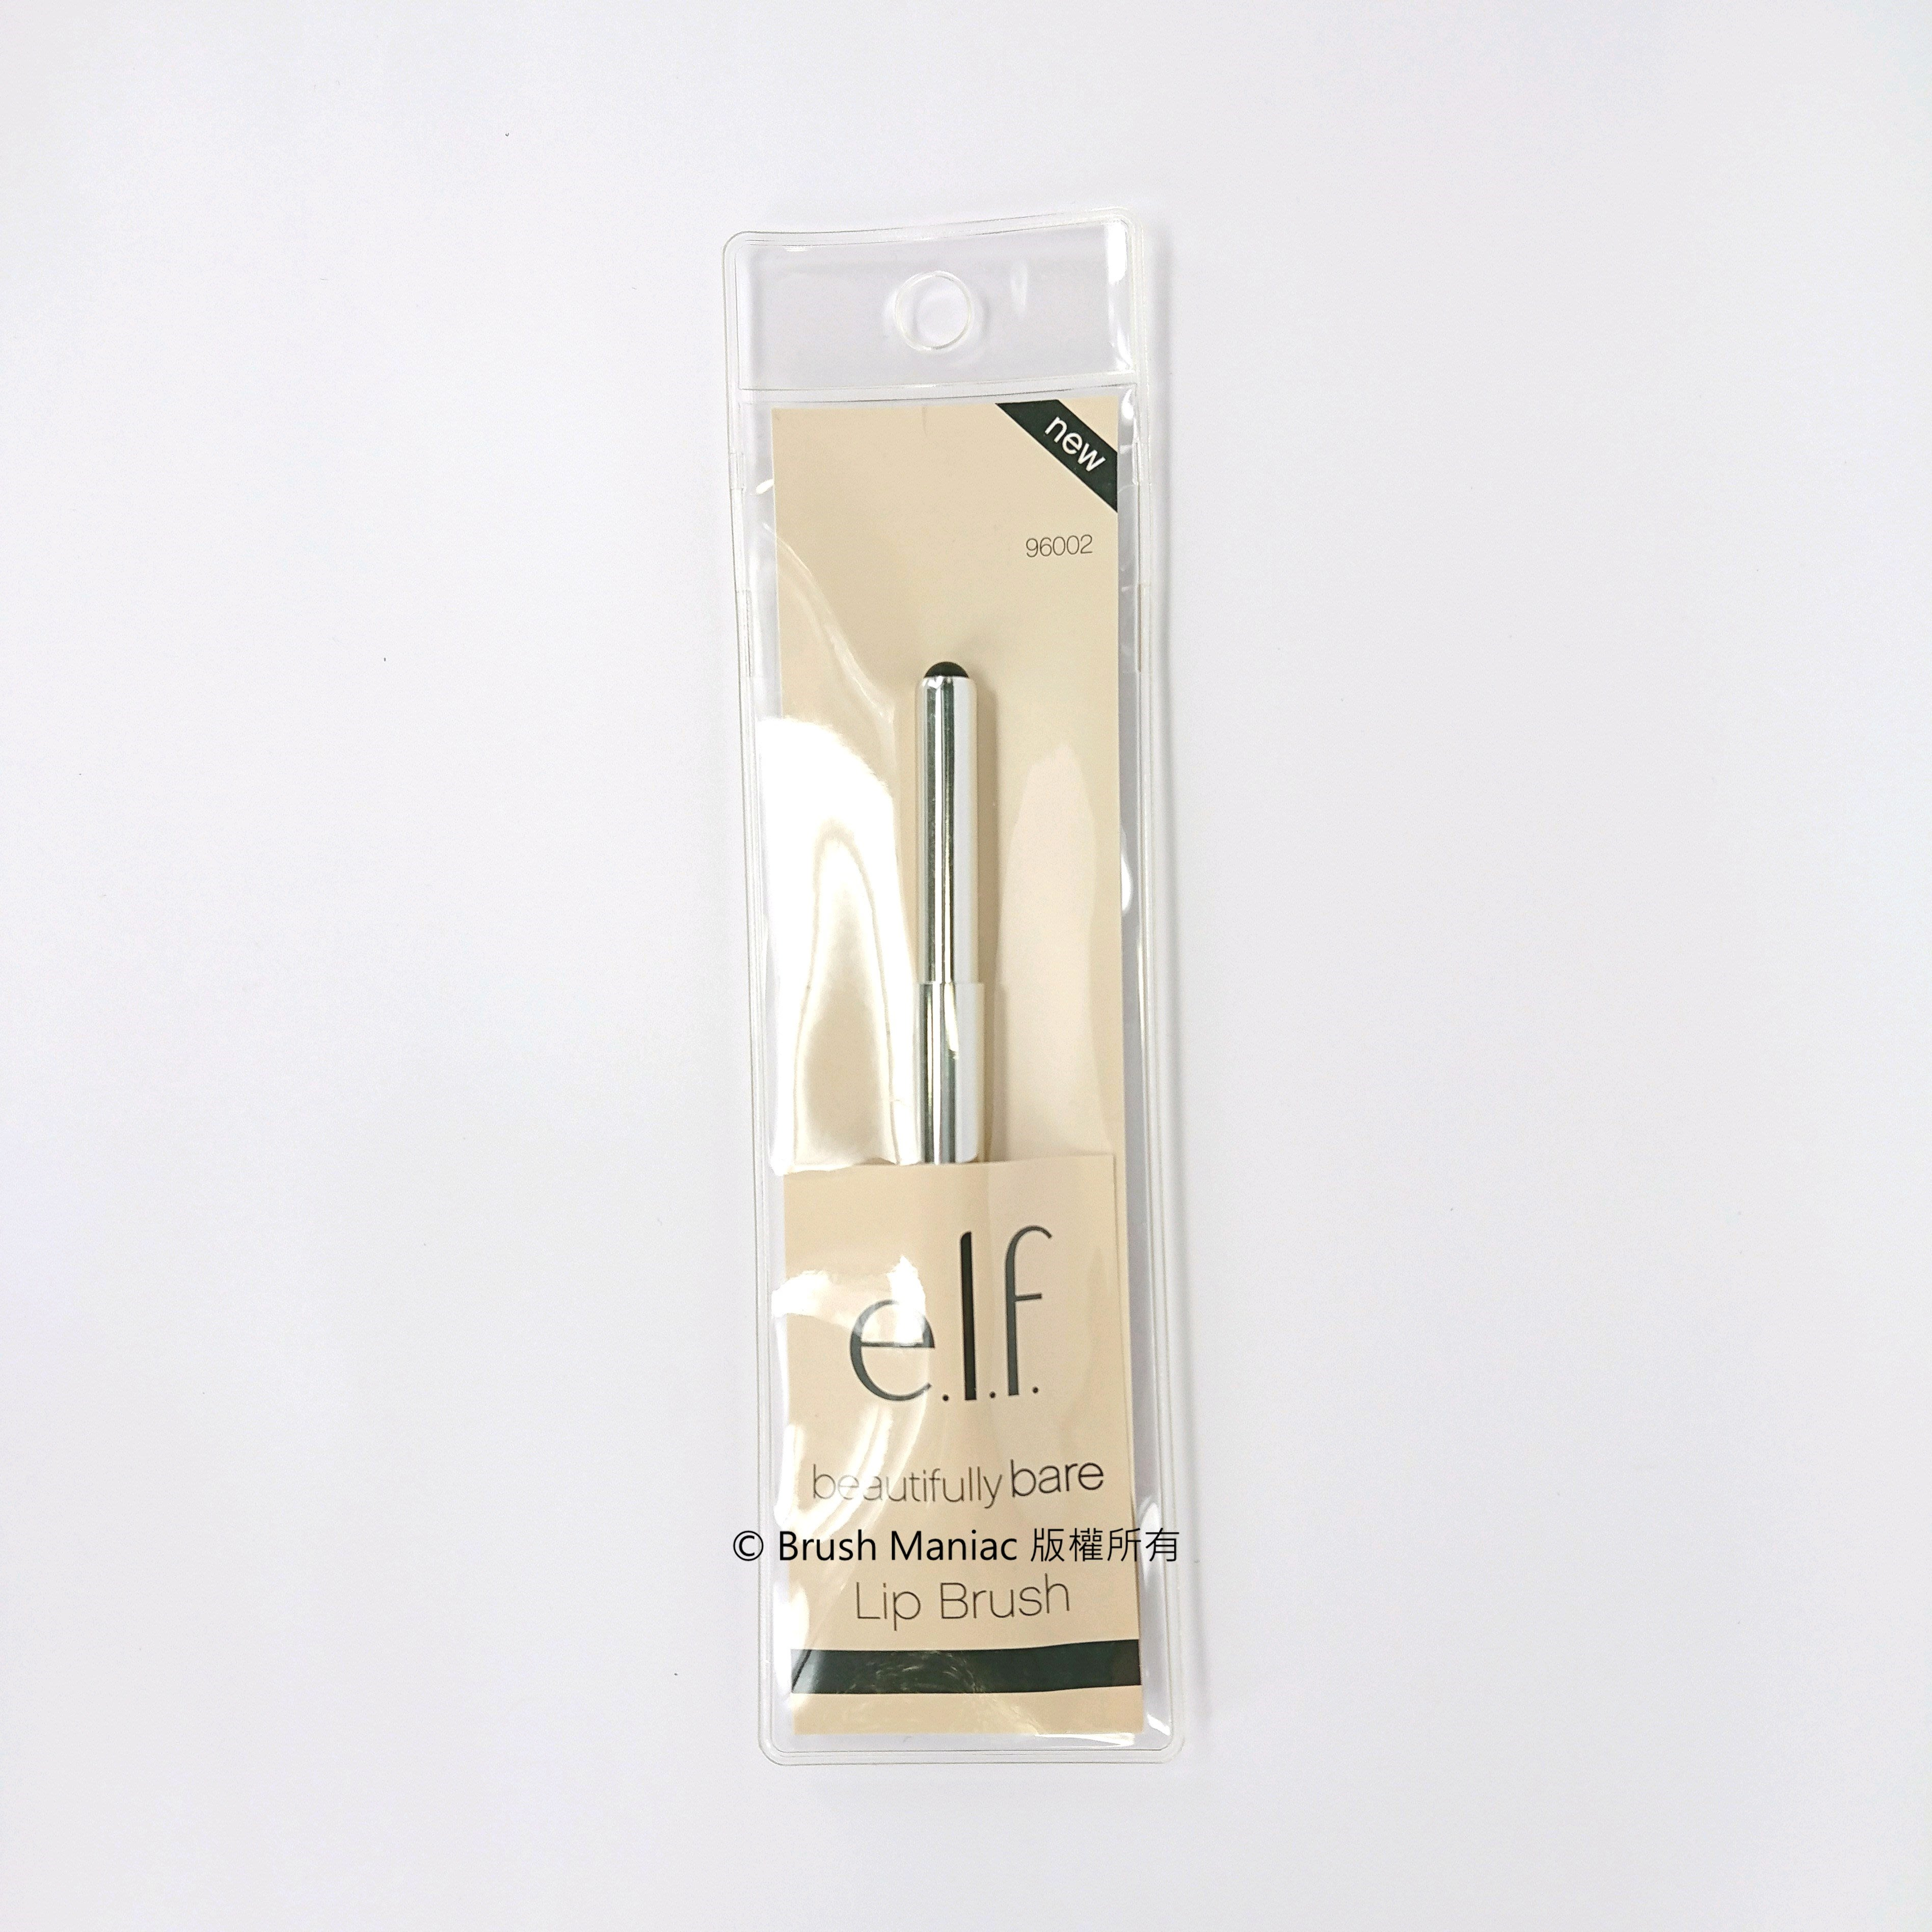 Brush Maniac - e.l.f. BEAUTIFULLY BARE LIP BRUSH 伸縮攜帶型唇刷